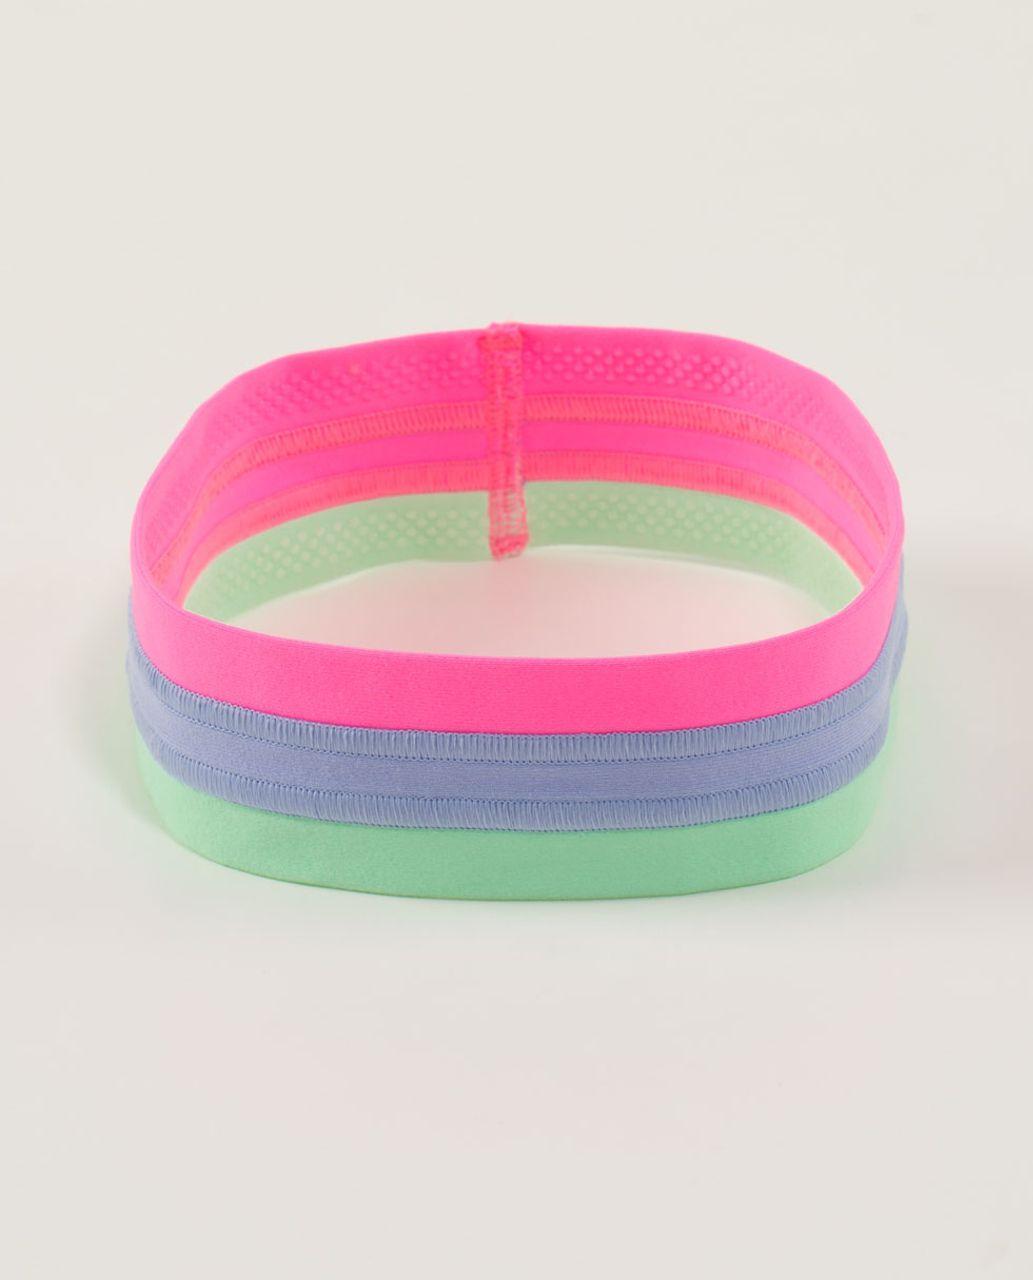 Lululemon Fly Away Tamer *Quilt - Zing Pink Light / Lavender Dusk / Fresh Teal